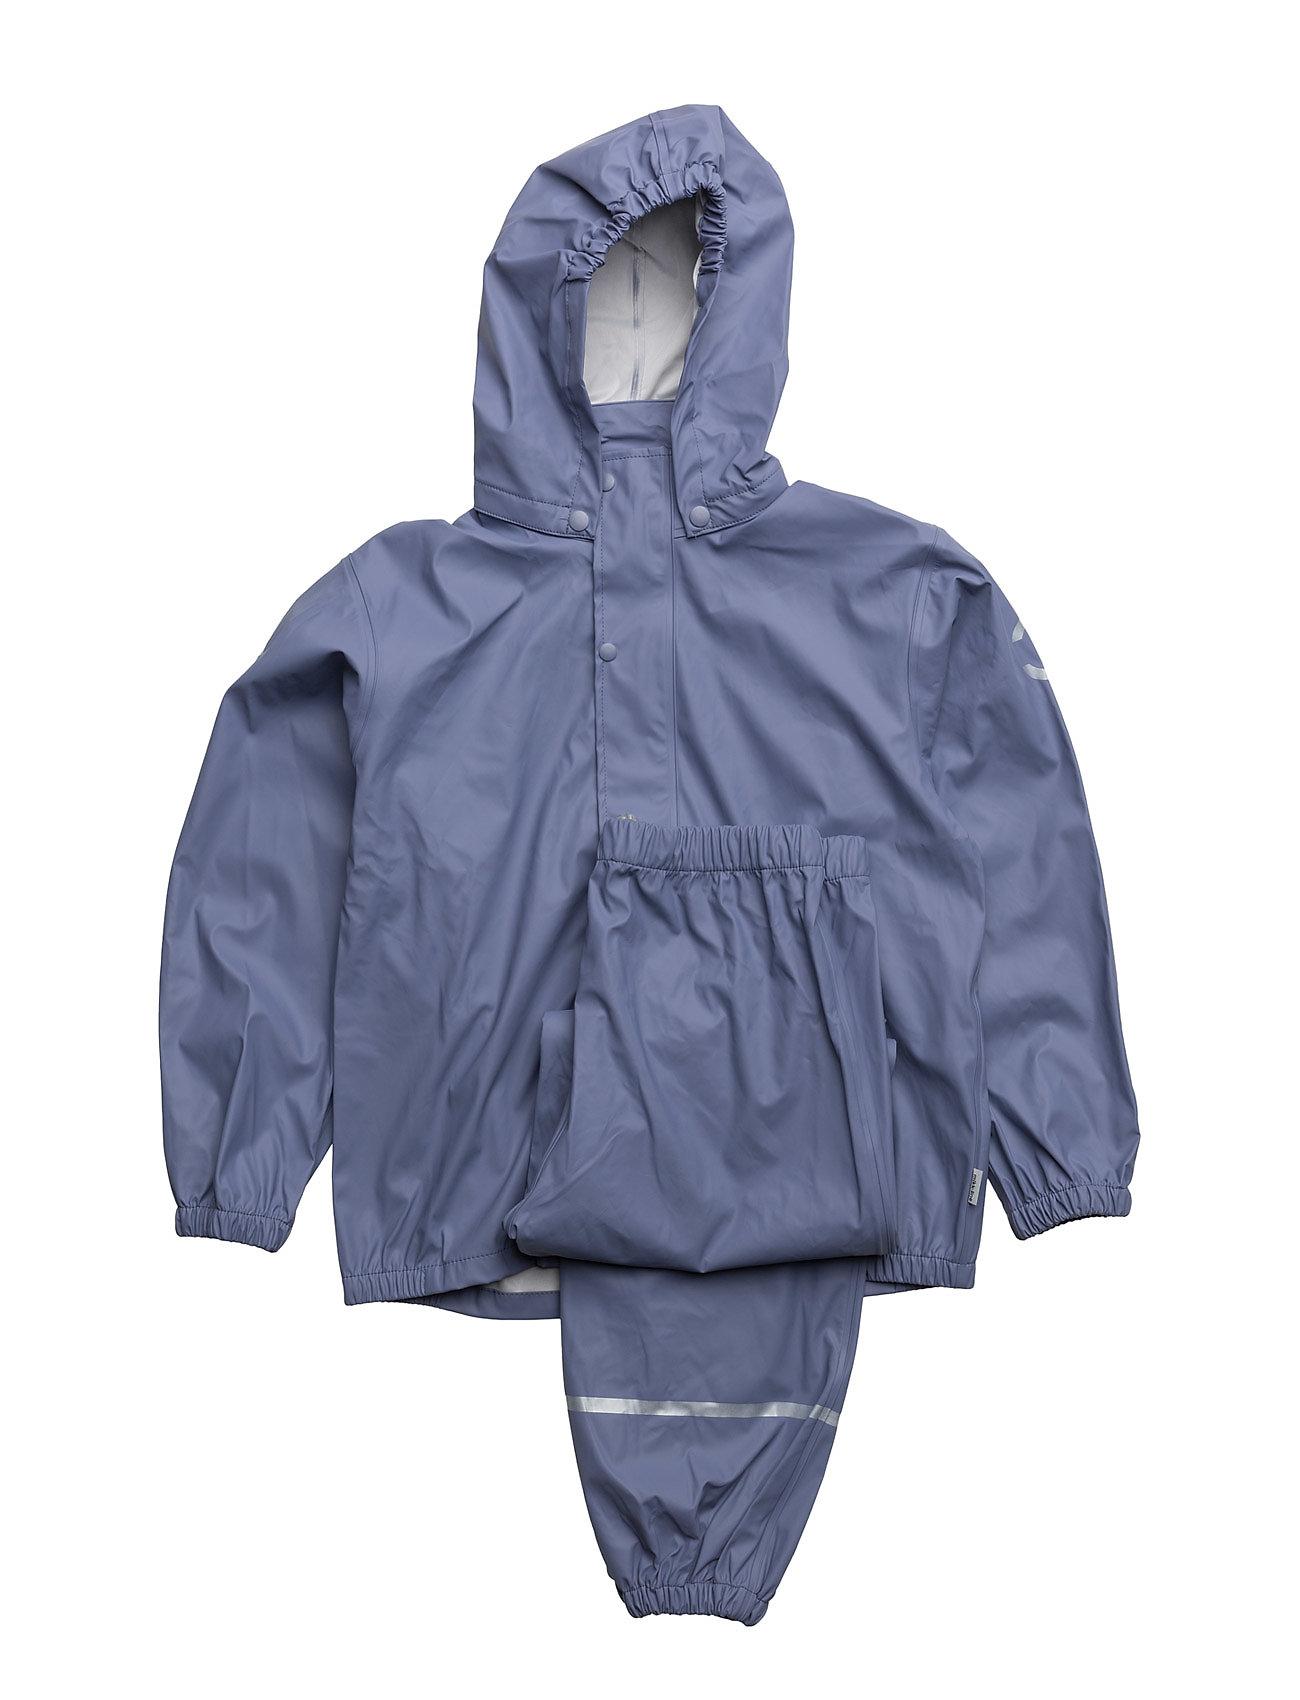 Pu Rain Set Mikk-Line Regntøj til Børn i